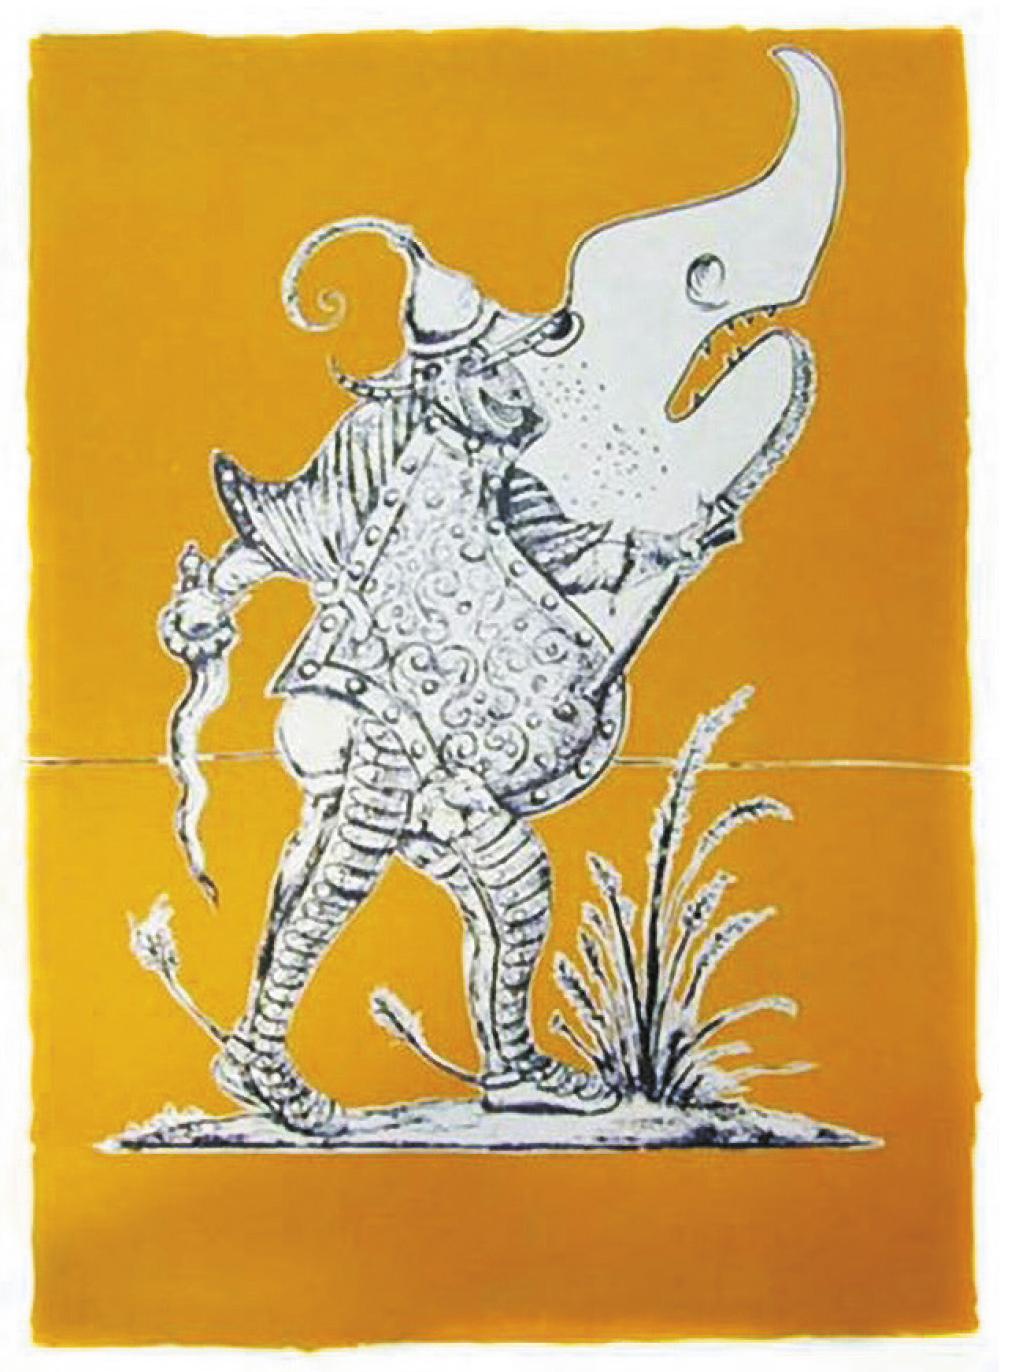 Lot 87 - Dalí Salvador (1904-1989) Songes drôlatiques de Pantagruel, 1973 Lithograph - N° [...]